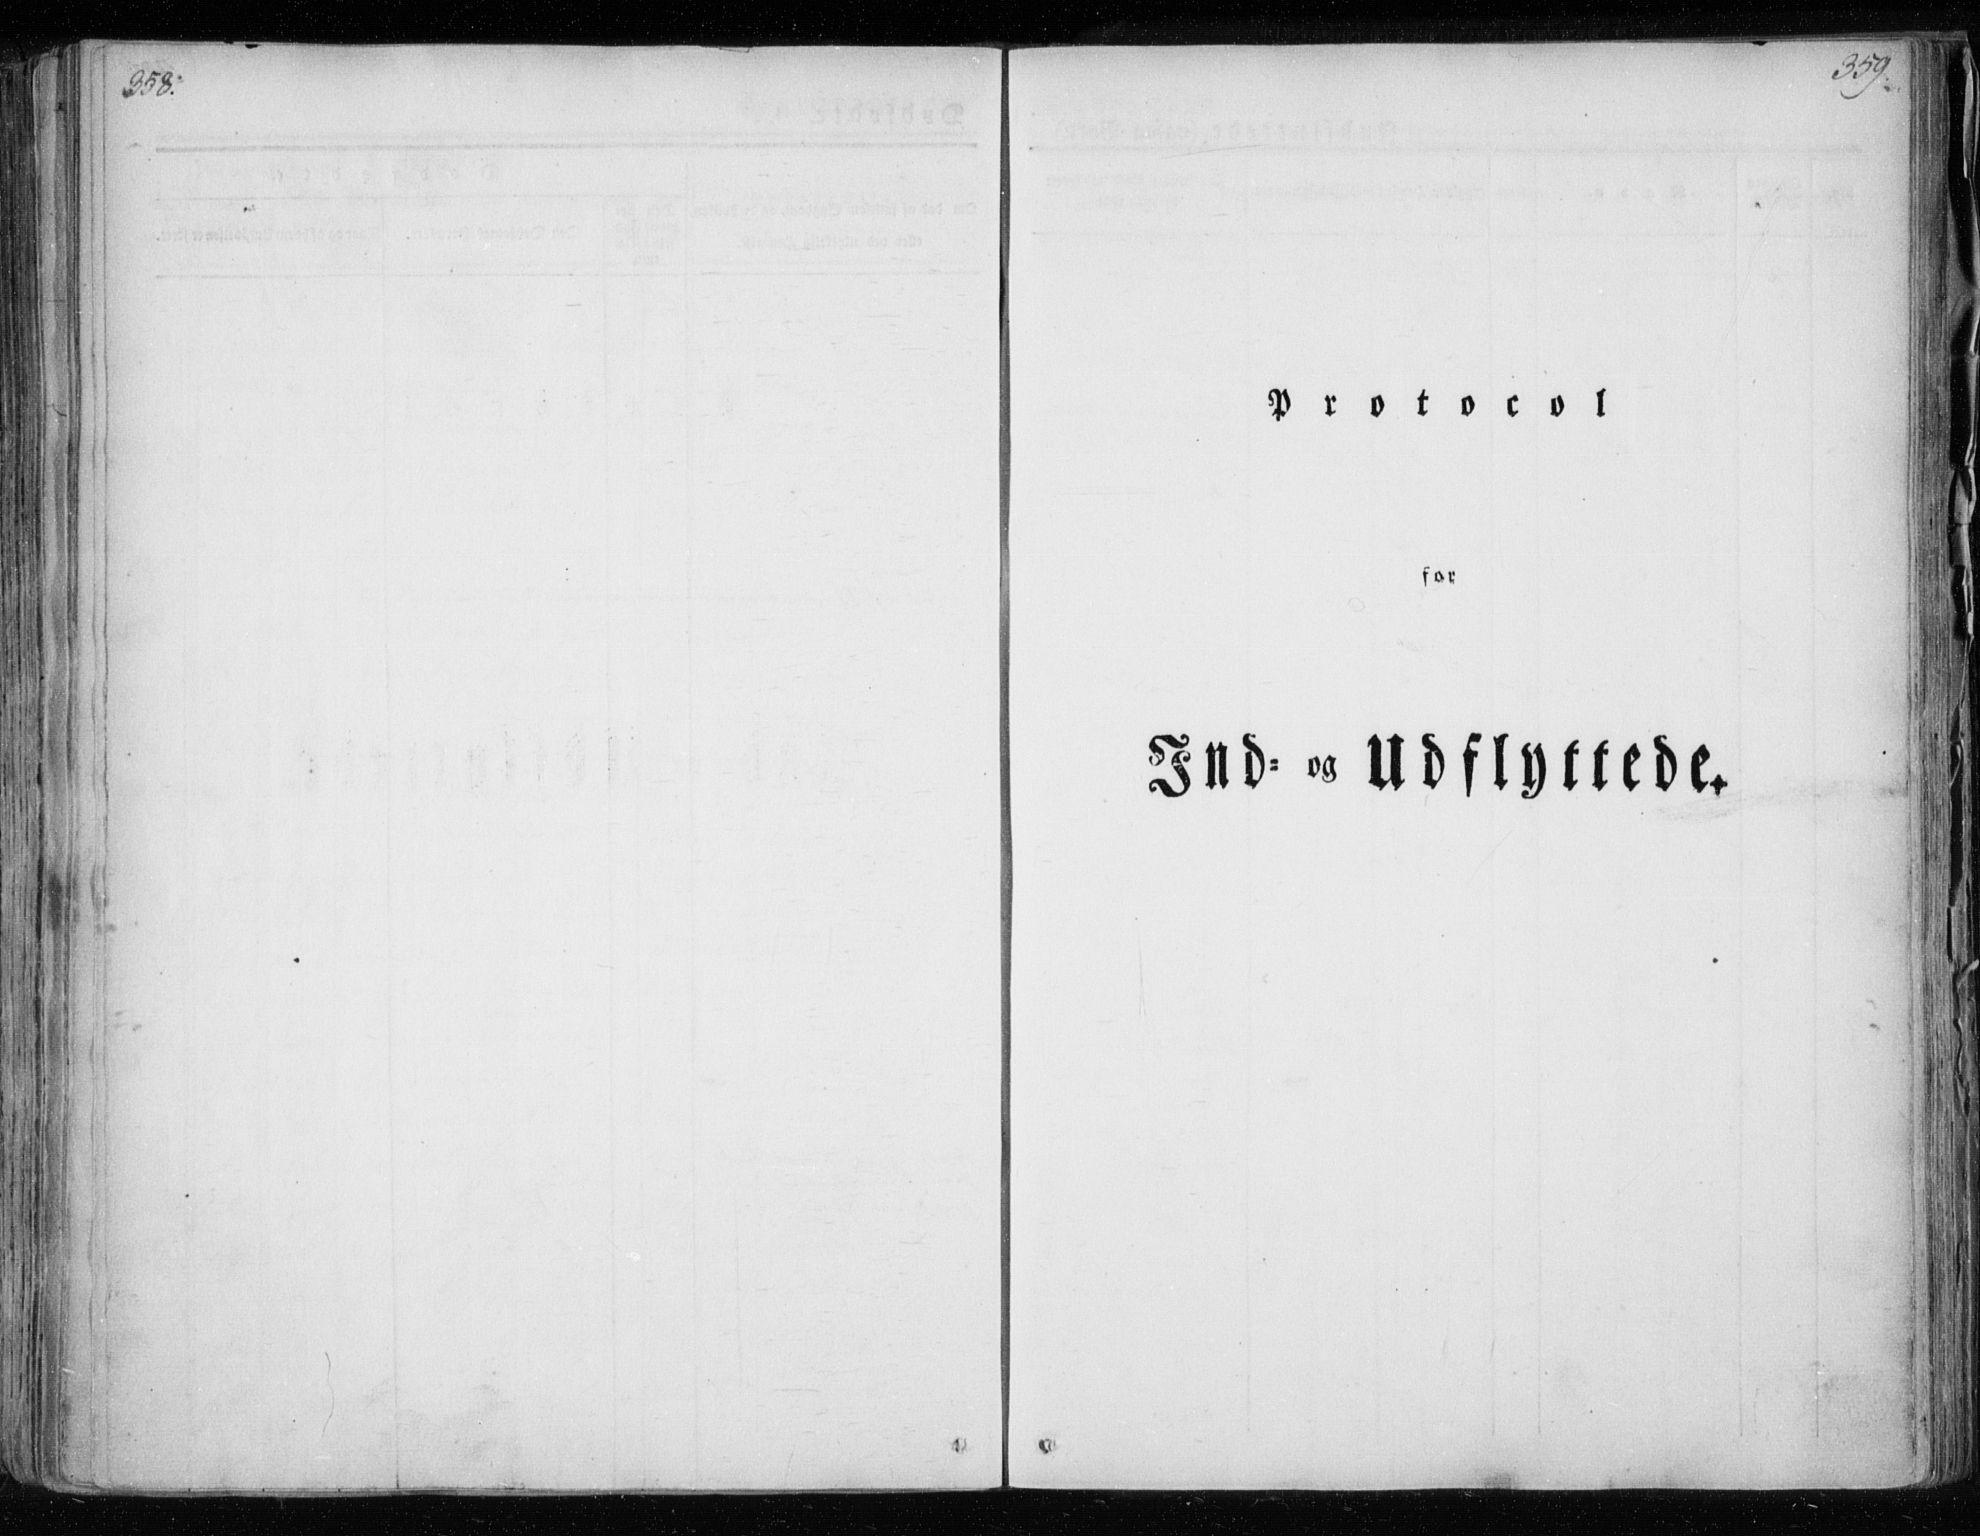 SAT, Ministerialprotokoller, klokkerbøker og fødselsregistre - Nordland, 825/L0354: Ministerialbok nr. 825A08, 1826-1841, s. 358-359